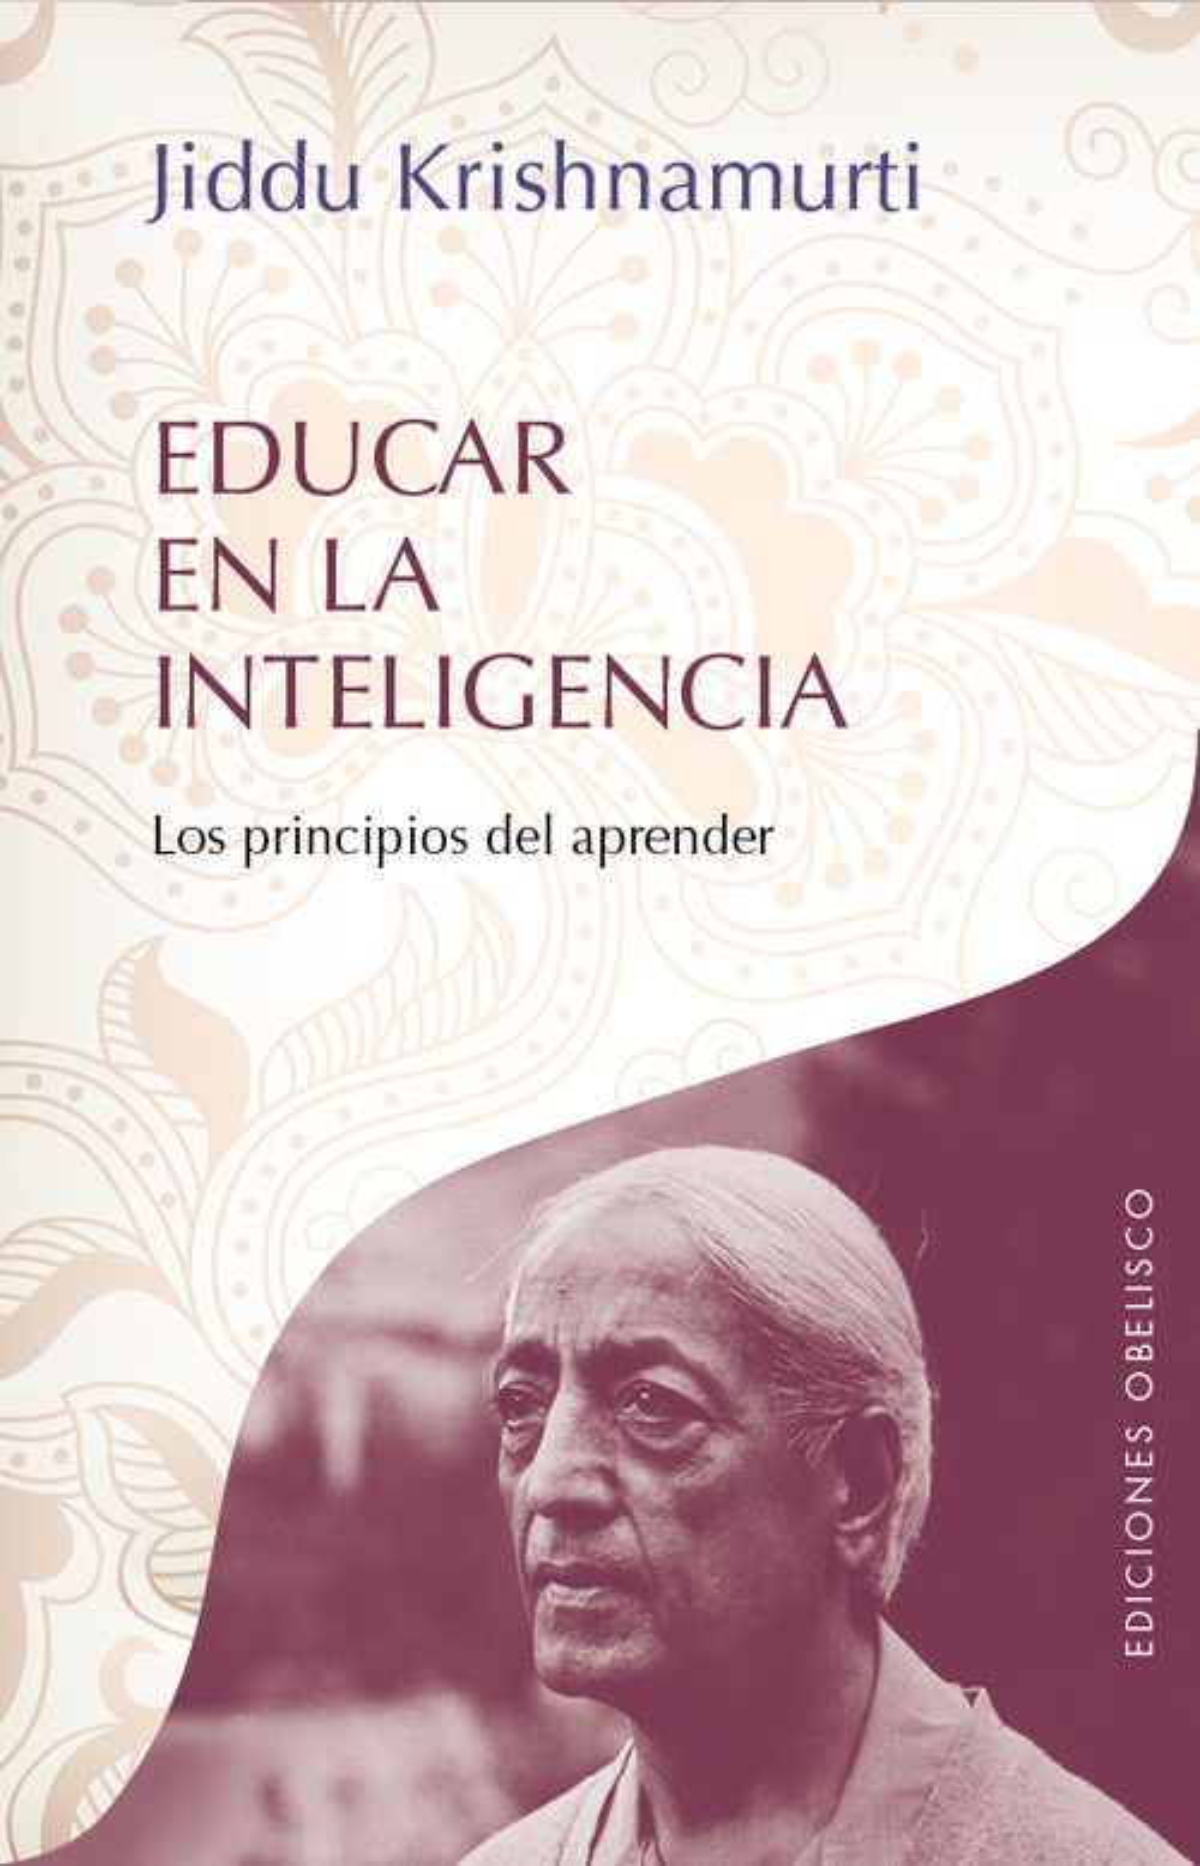 EDUCAR EN LA INTELIGENCIA 9788491110941